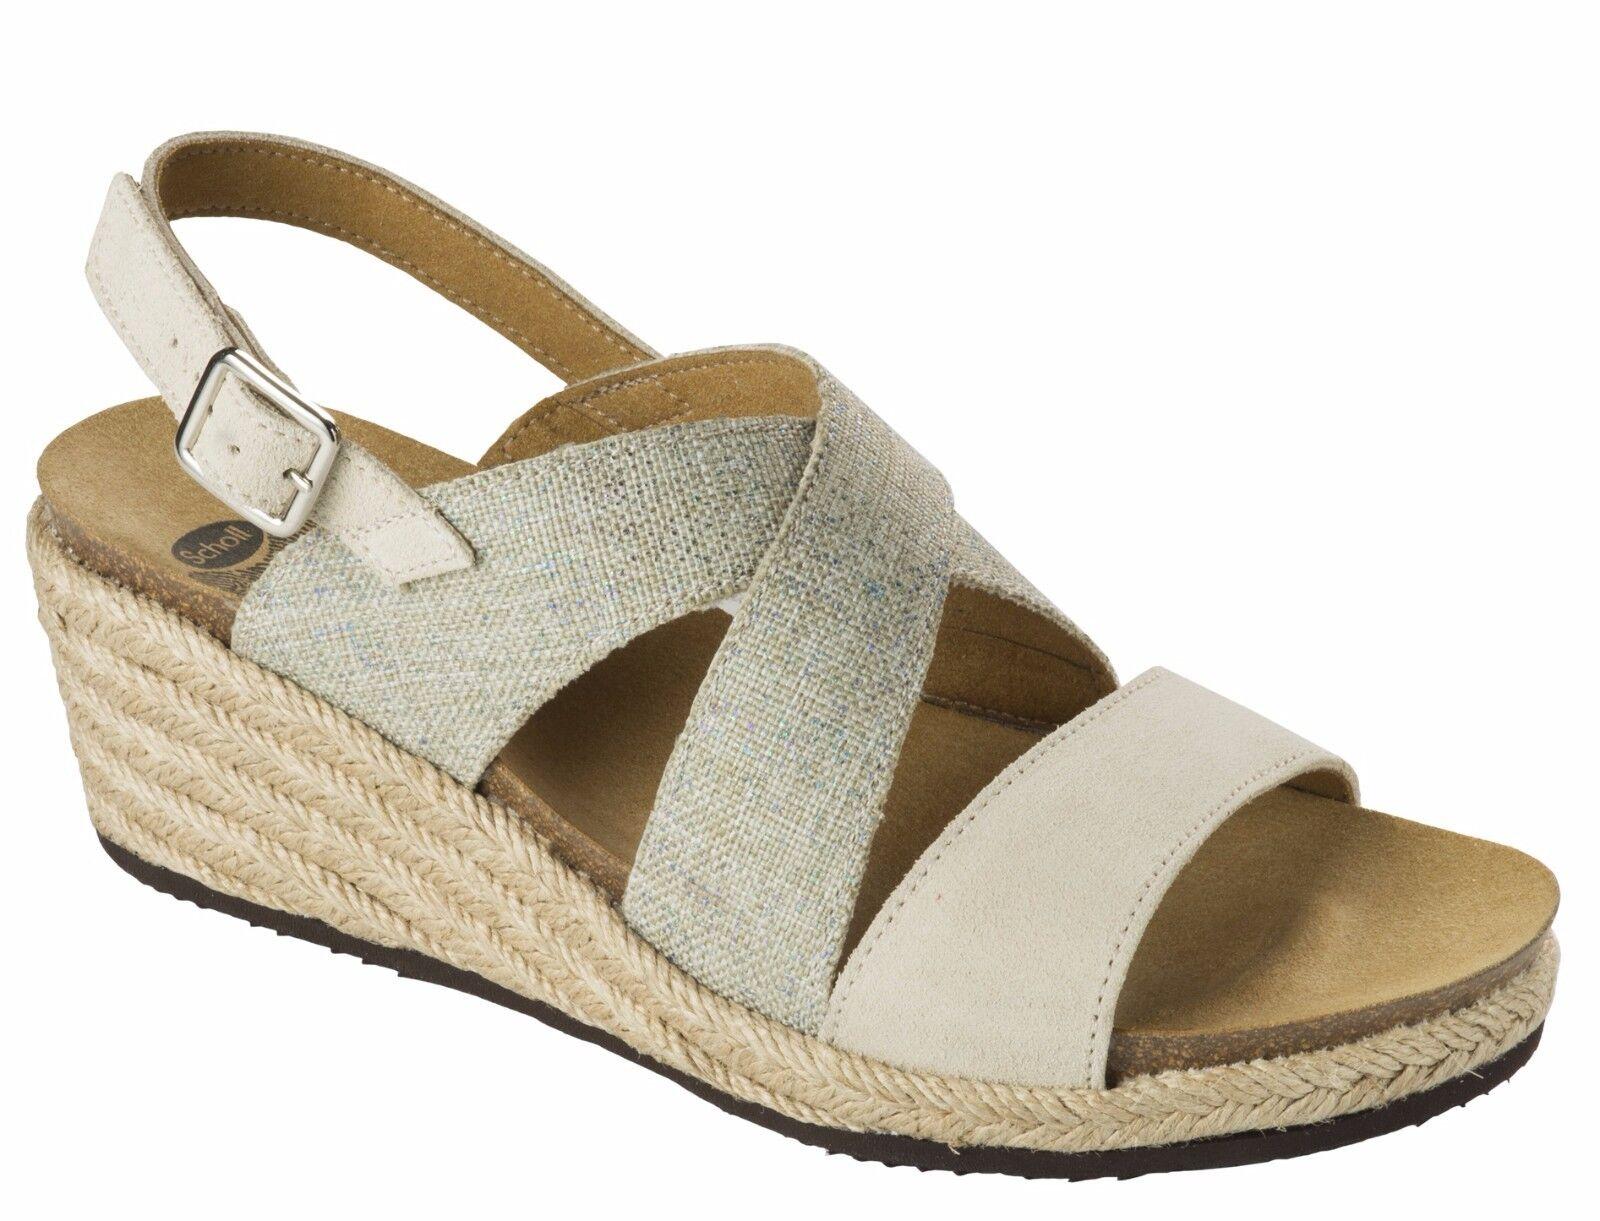 SCHOLL SOTIRIA pantofole BioPrint sandali pantofole SOTIRIA ciabatte zoccoli infradito donna zeppa 6692ba